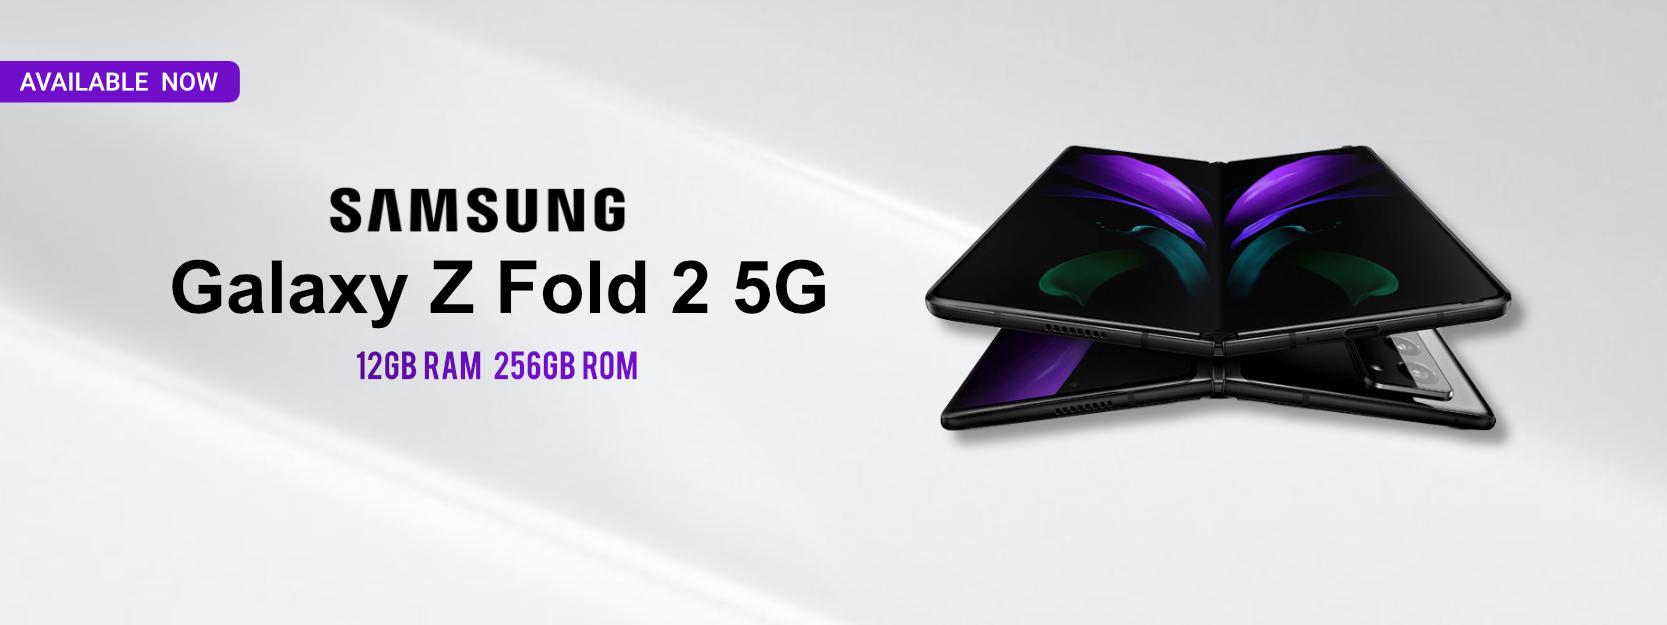 Samsung Galaxy Z Fold In Qatar and Doha